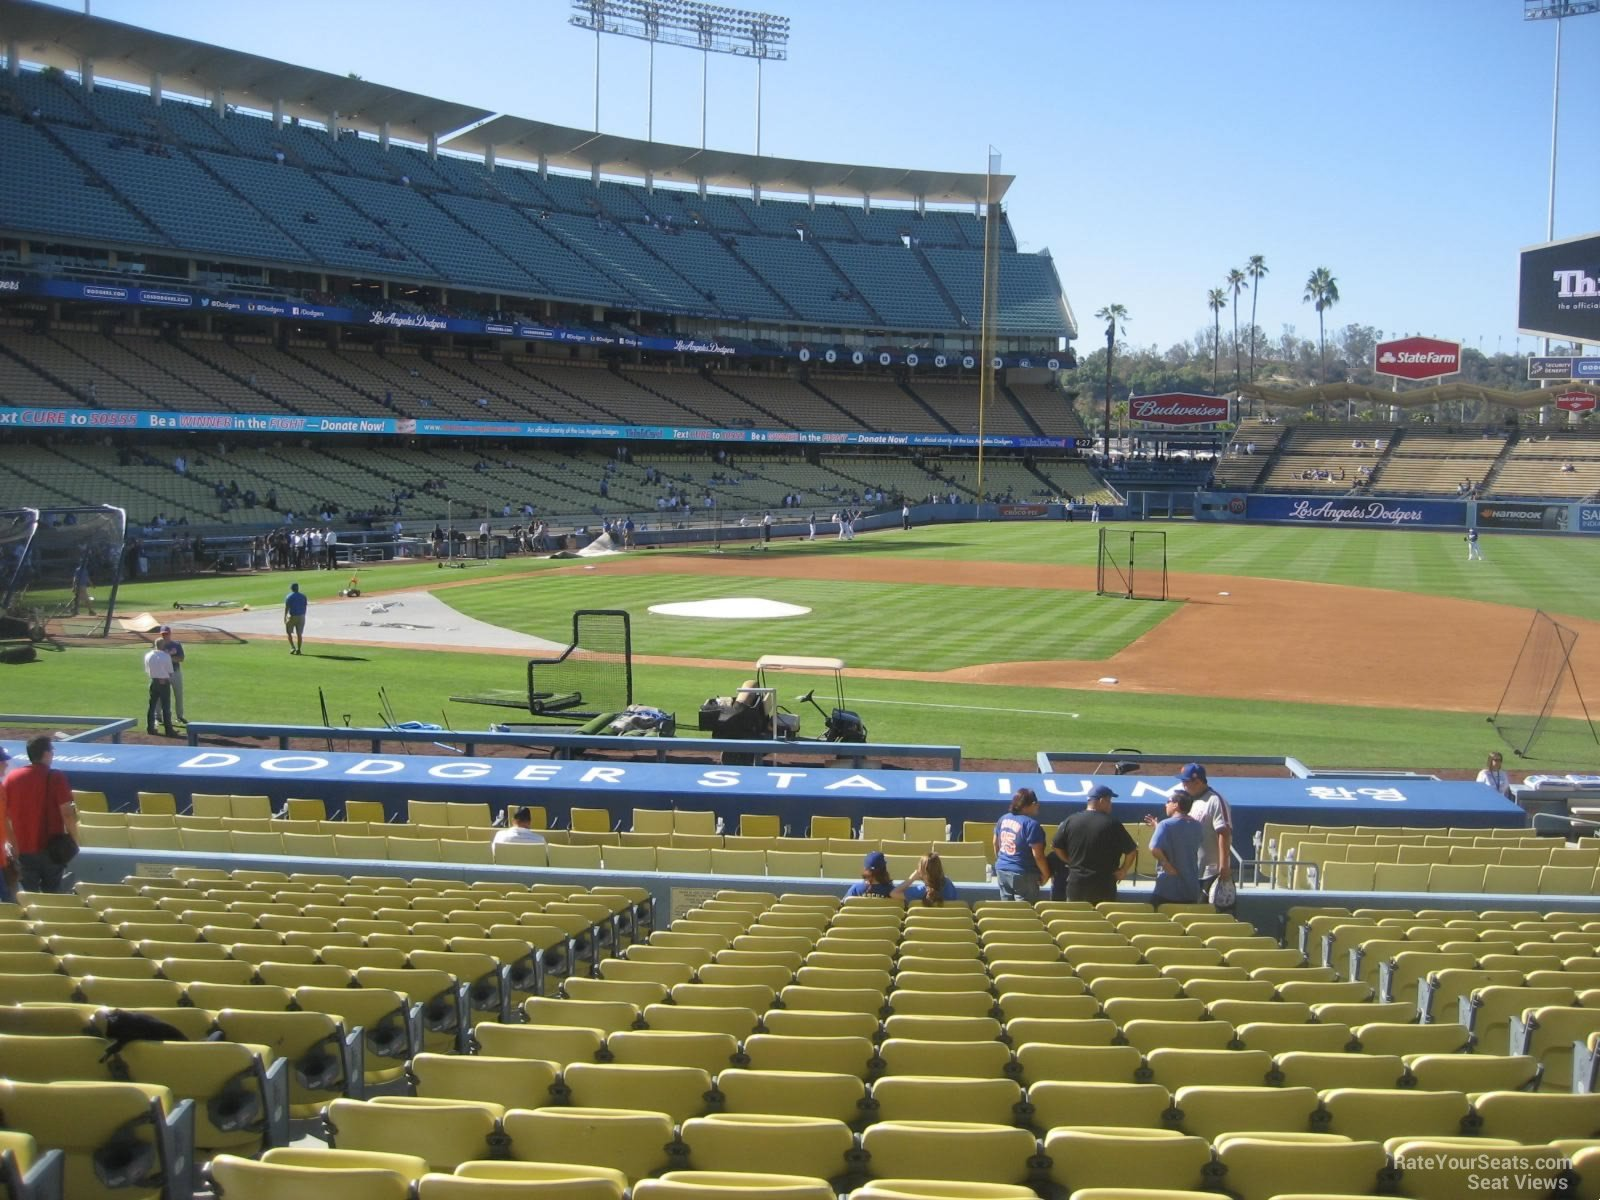 Dodger Stadium Section 22 - RateYourSeats.com